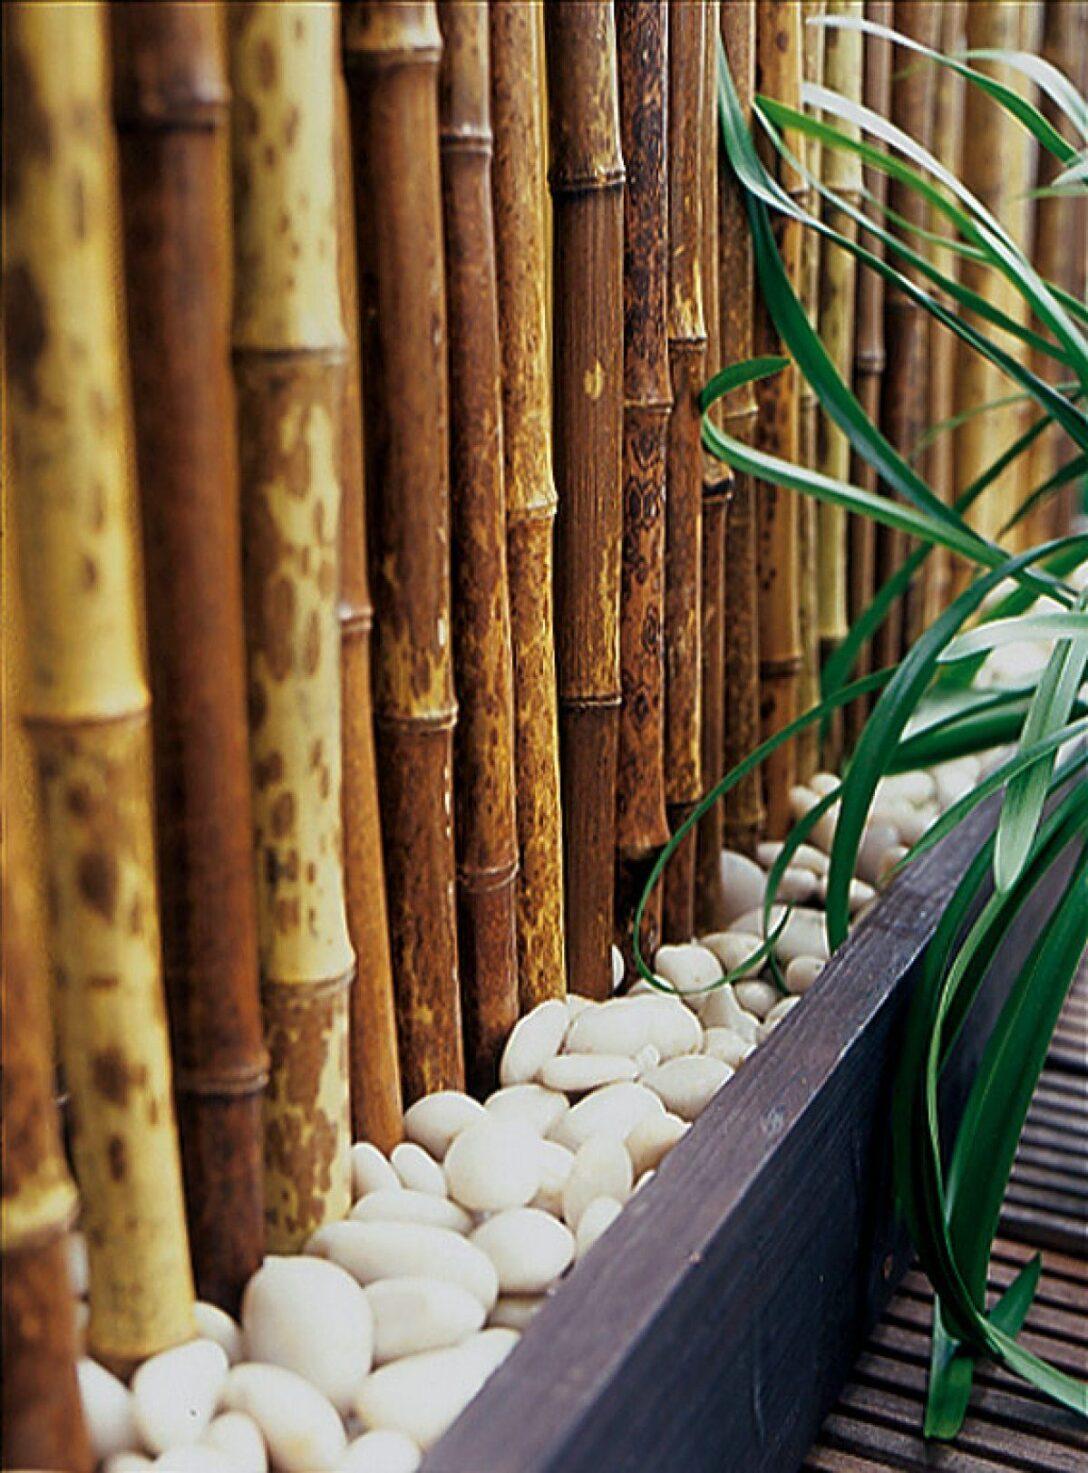 Large Size of Paravent Bambus Balkon Fotostrecke Perfekte Abschirmung Balkonschirm Campania Von Garten Bett Wohnzimmer Paravent Bambus Balkon